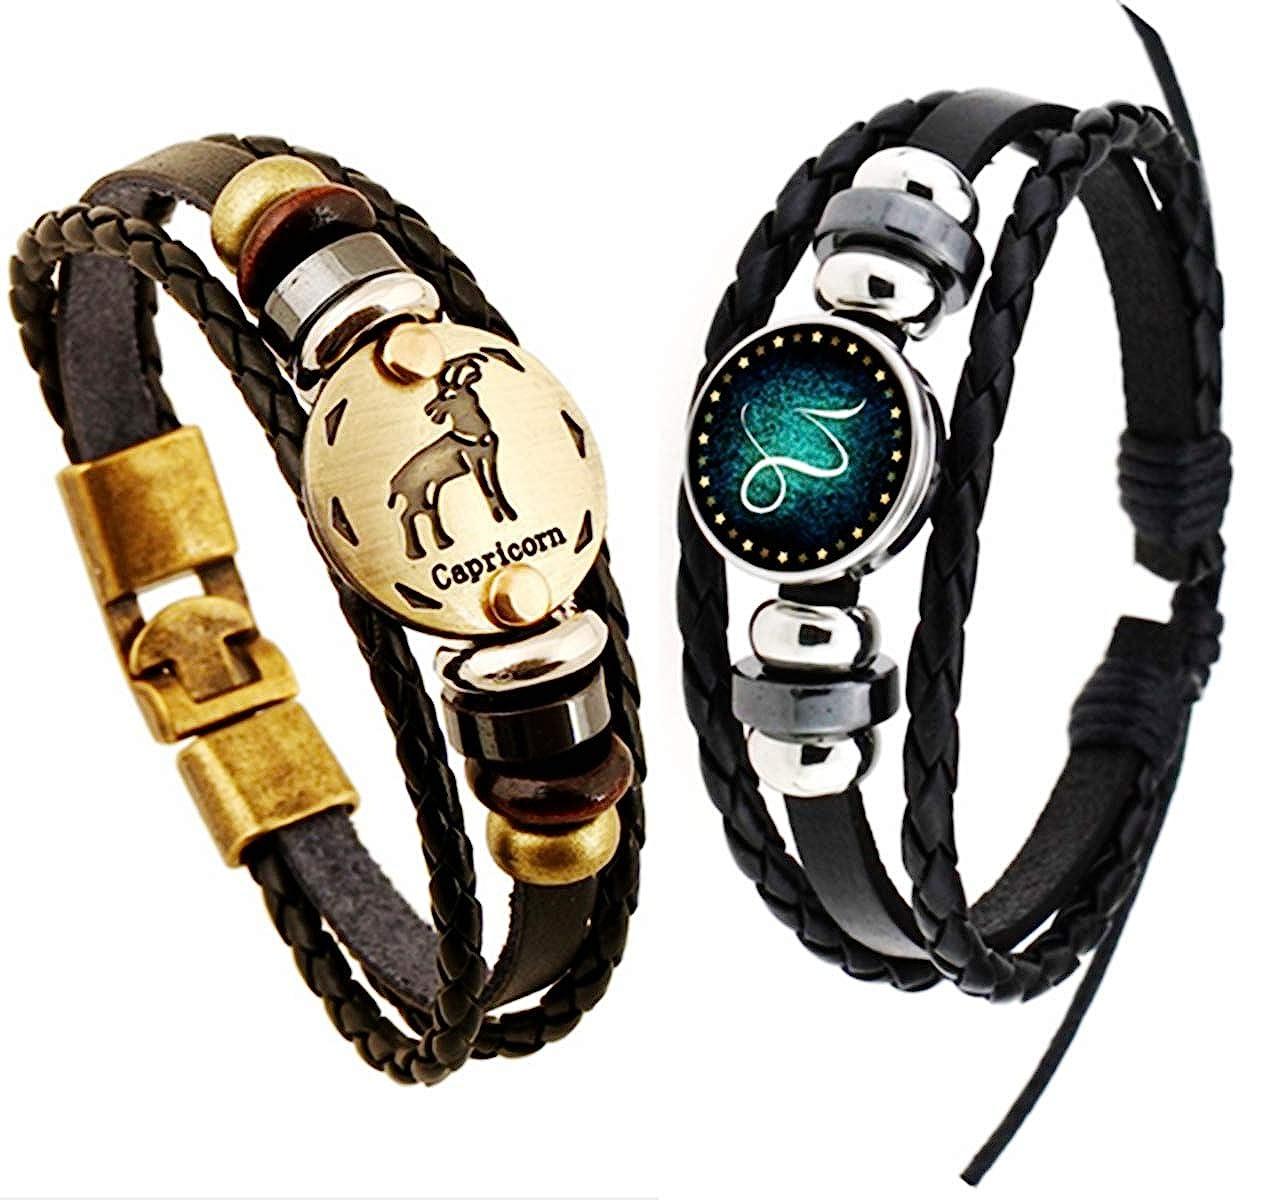 Newless 2 Pcs Constellation Leather Bracelet Punk Braided Rope Bracelet Bangle